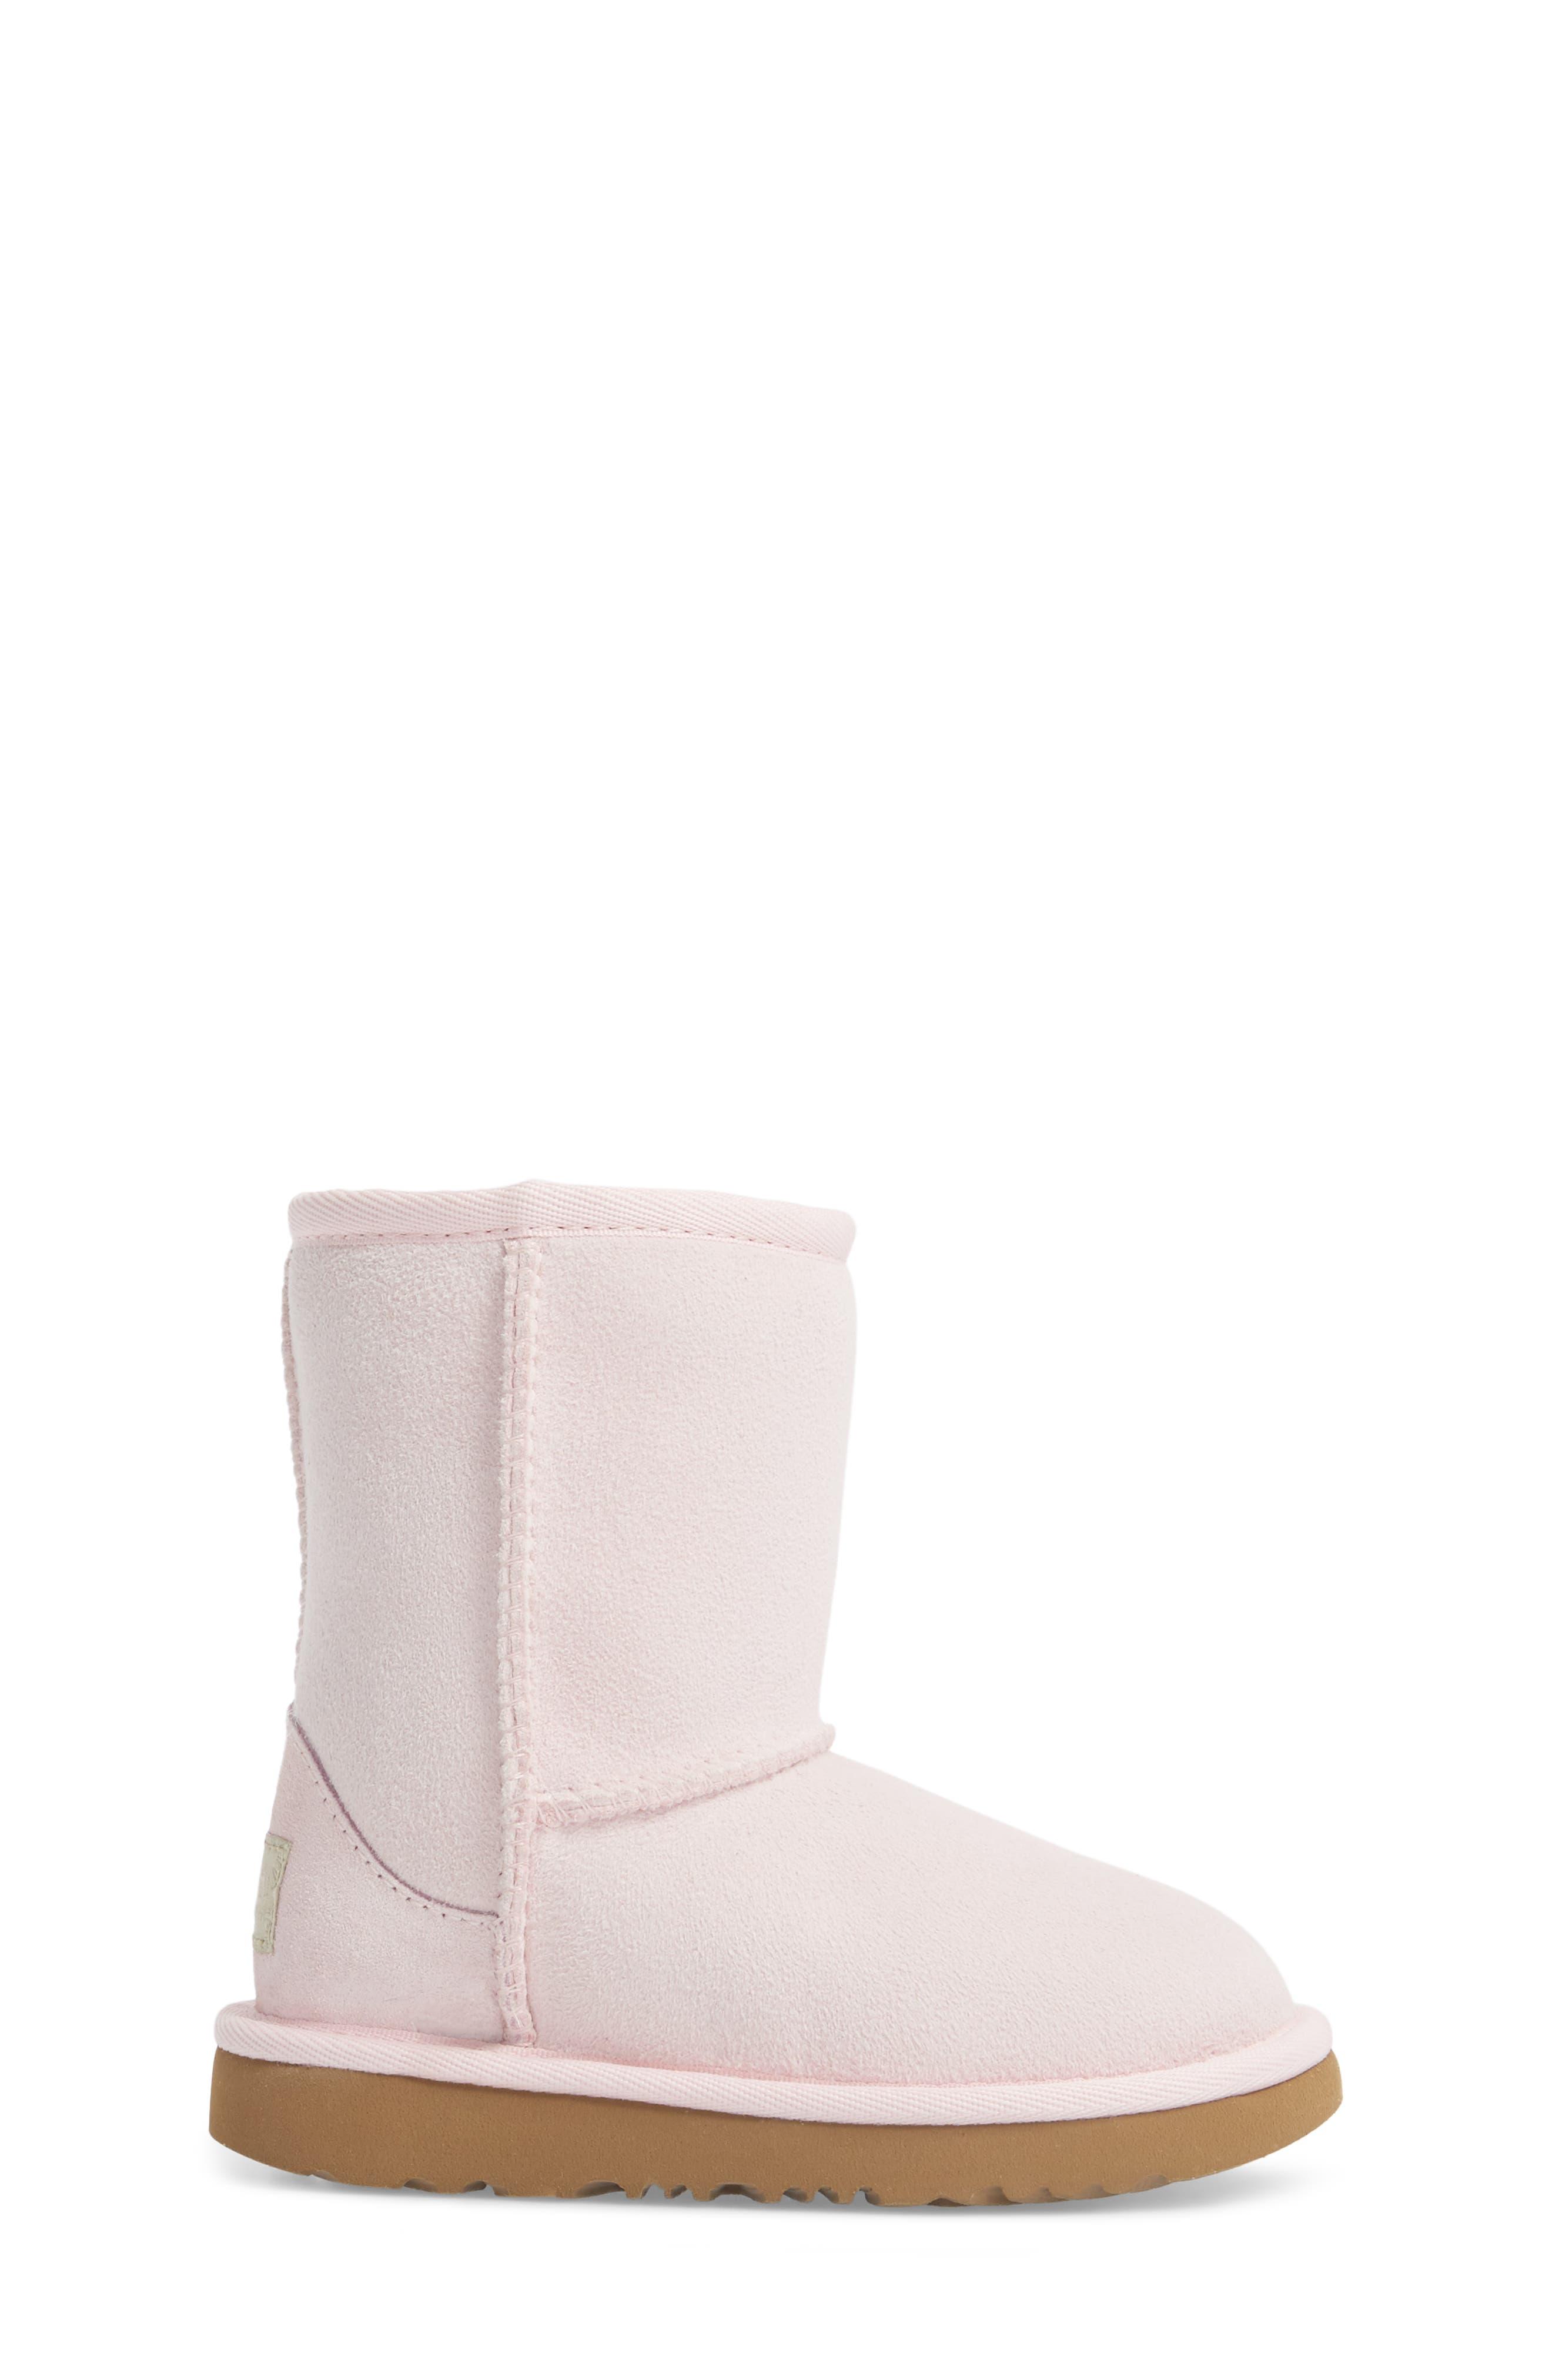 Alternate Image 3  - UGG® Classic II Water Resistant Genuine Shearling Boot (Walker, Toddler, Little Kid & Big Kid)